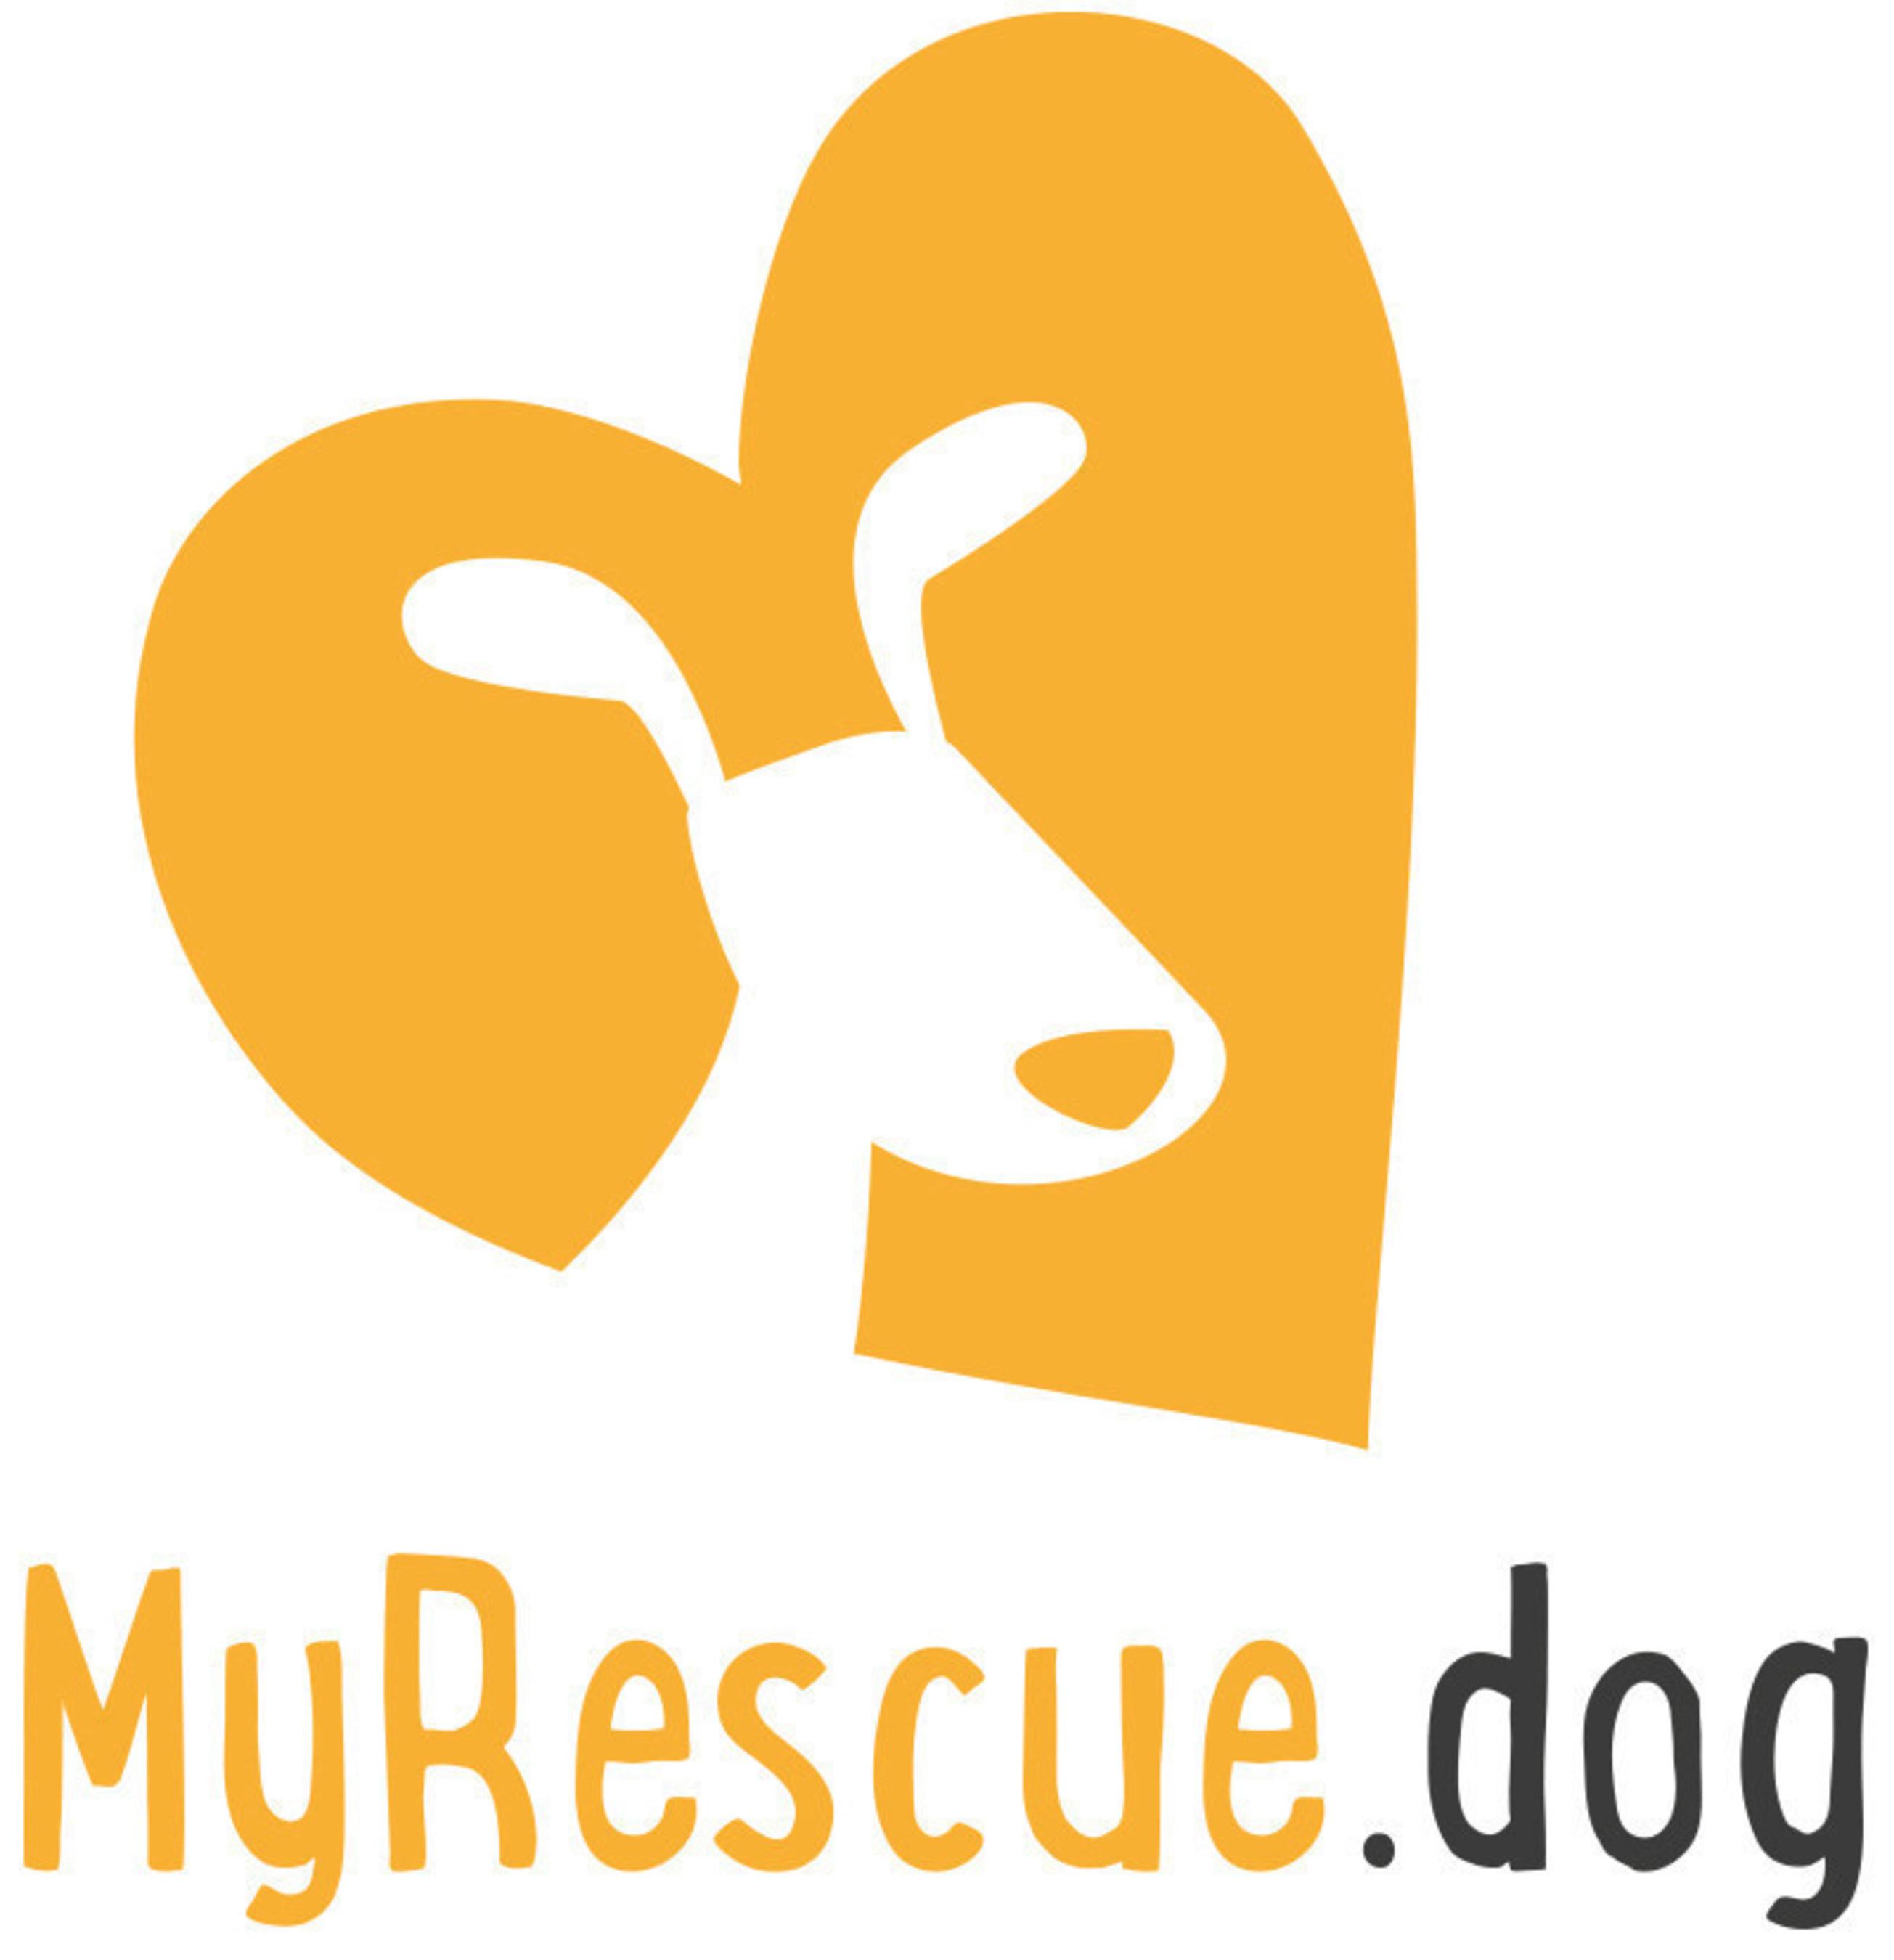 MyRescue.dog logo